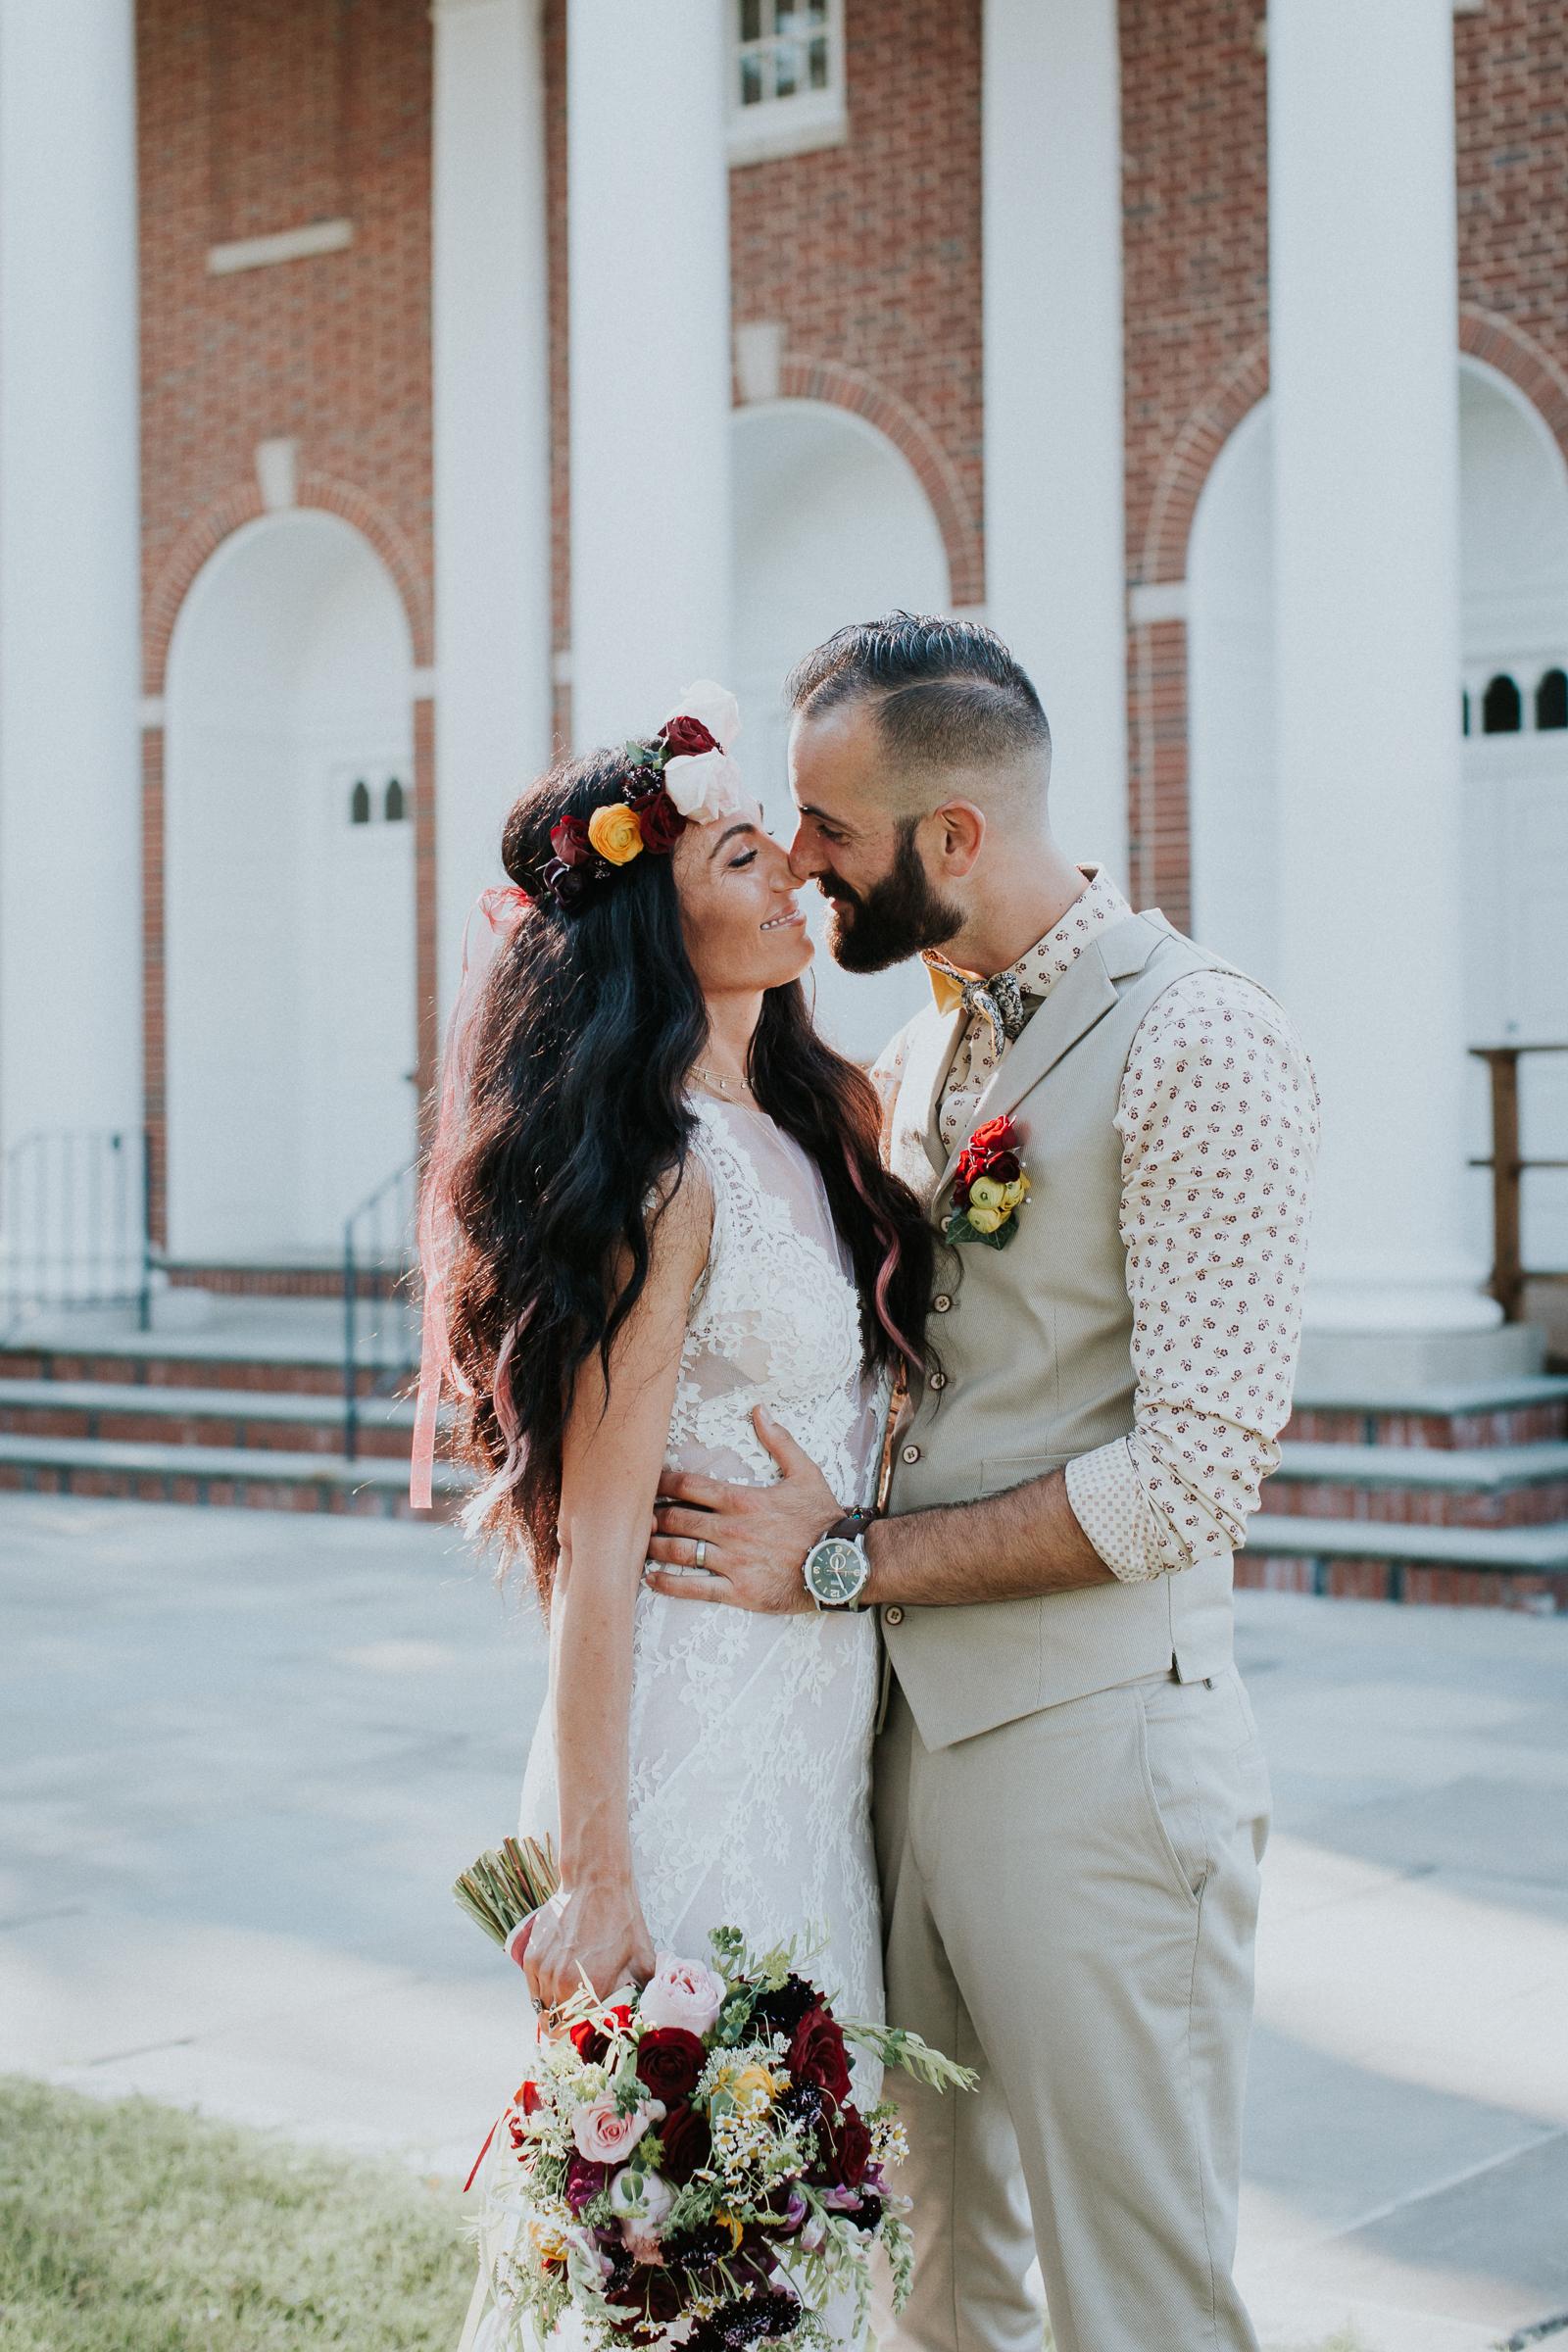 Backyard-Intimate-Adventurous-Destination-Wedding-Darien-Connecticut-Documentary-Wedding-Photography-76.jpg